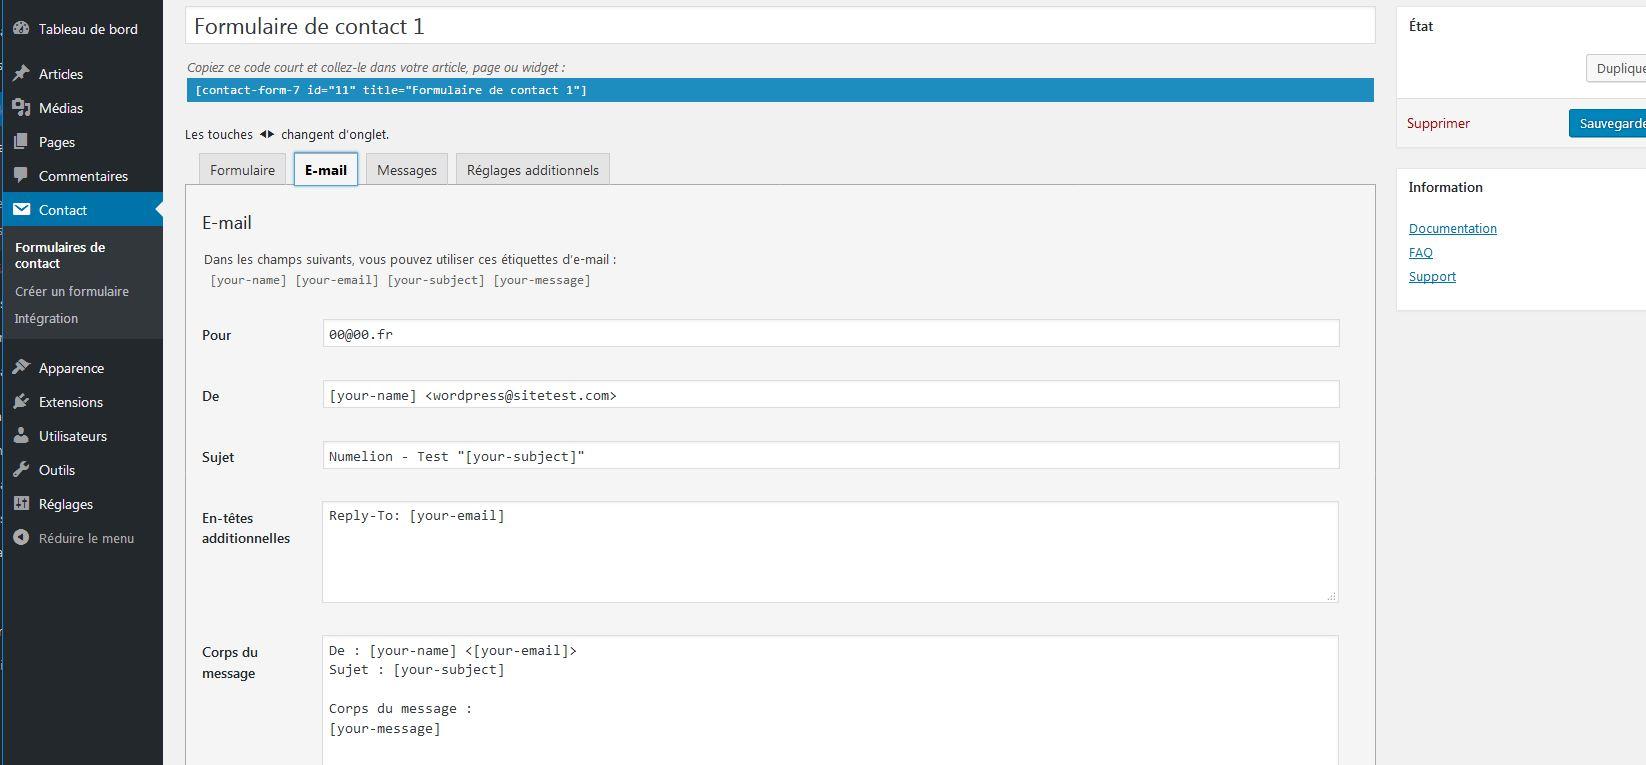 Installer Un Formulaire De Contact Dans Wordpress Avec Contact Form